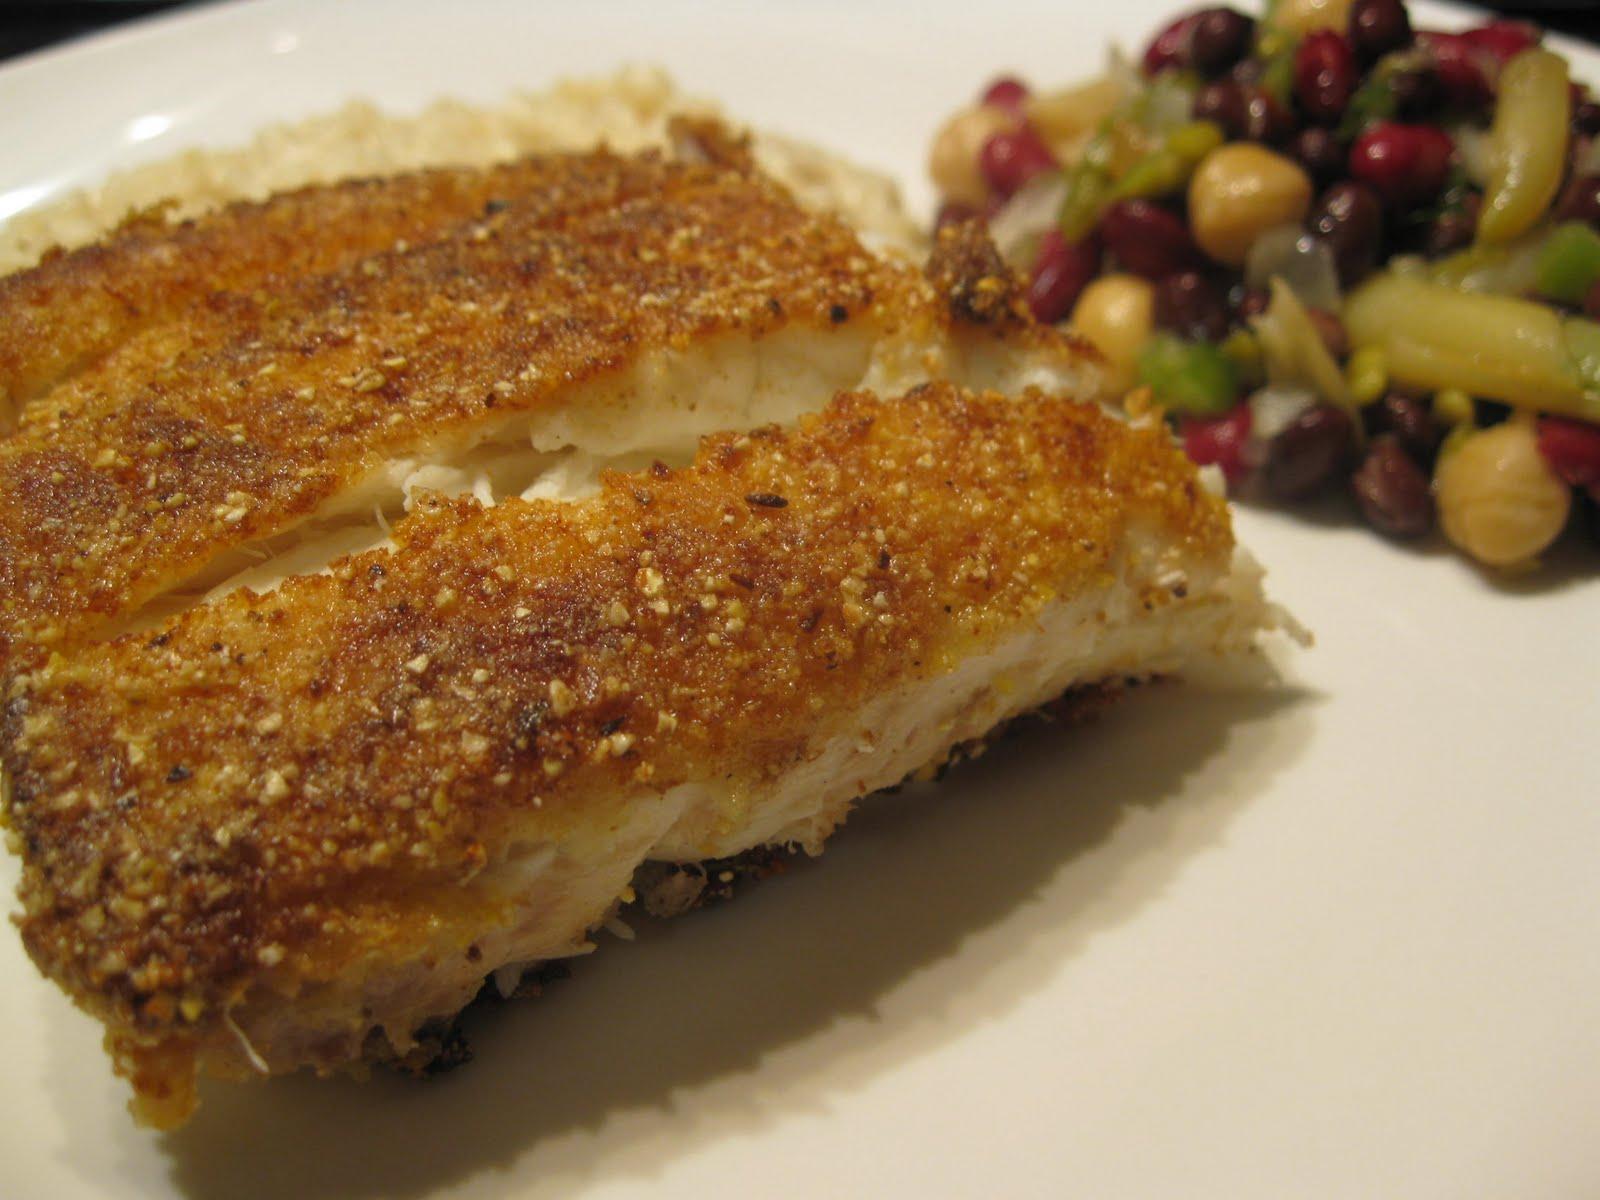 Fried flounder cornmeal for Cornmeal fish fry batter